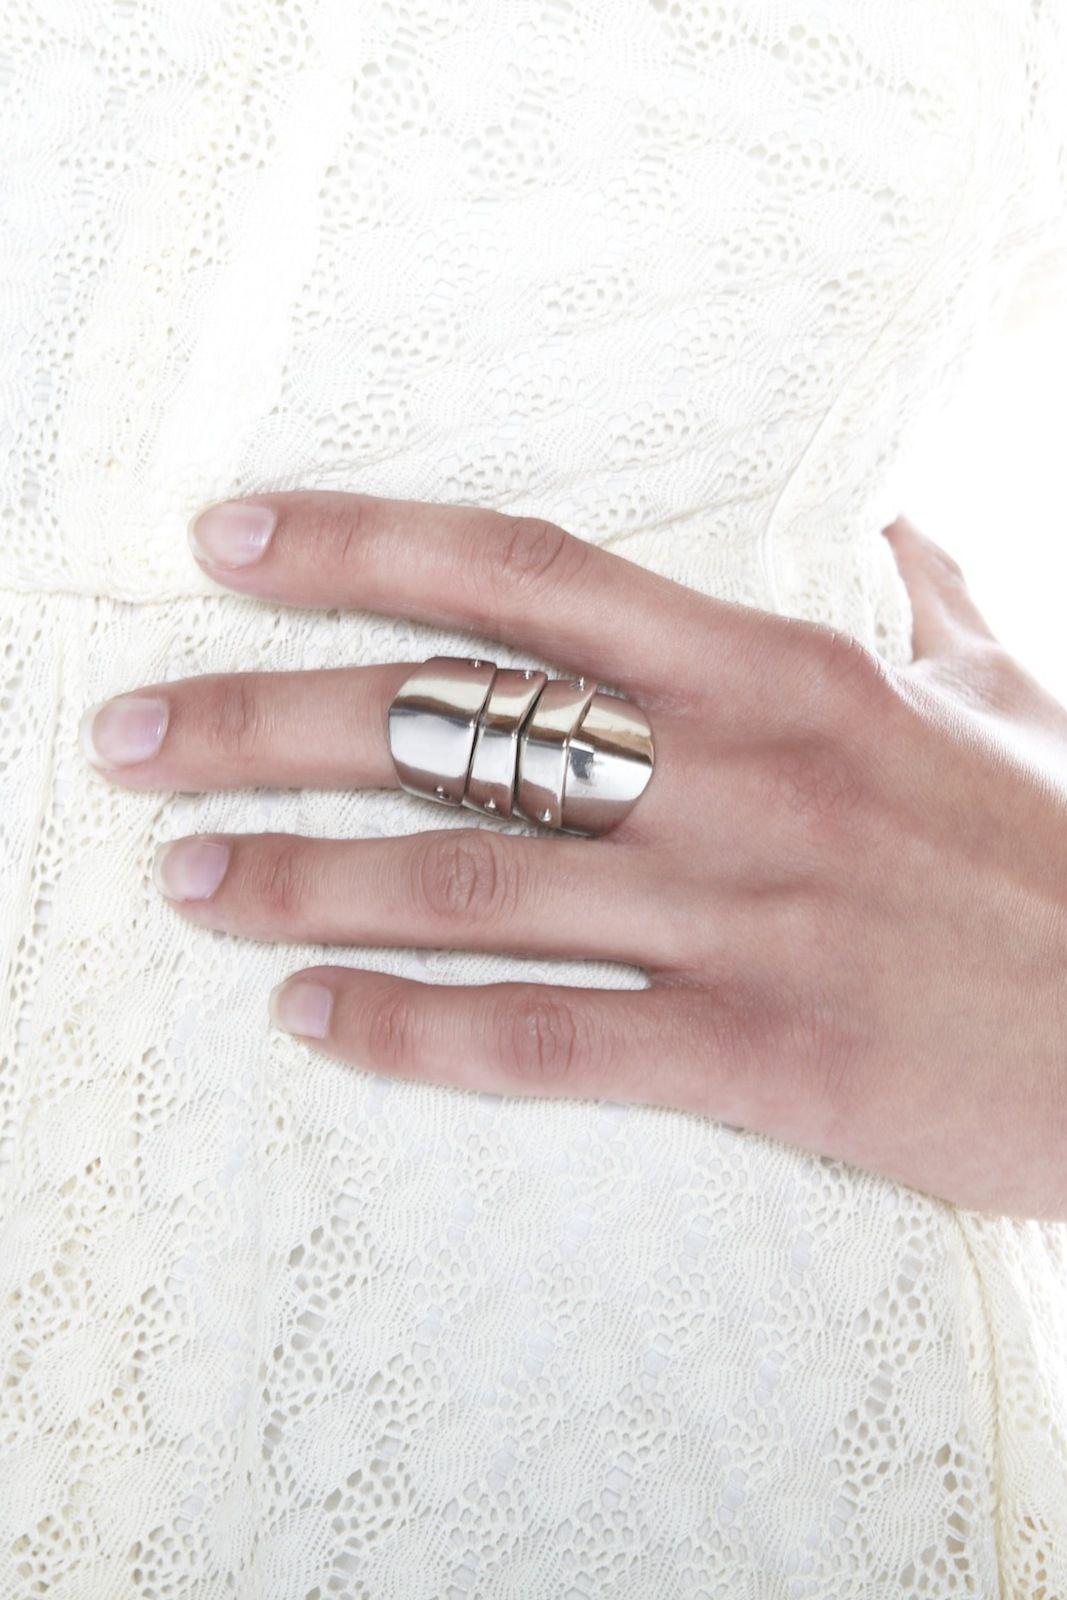 Armor-Dillo Ring, very Texan. | Jewelry | Pinterest | Ring, Jewel ...